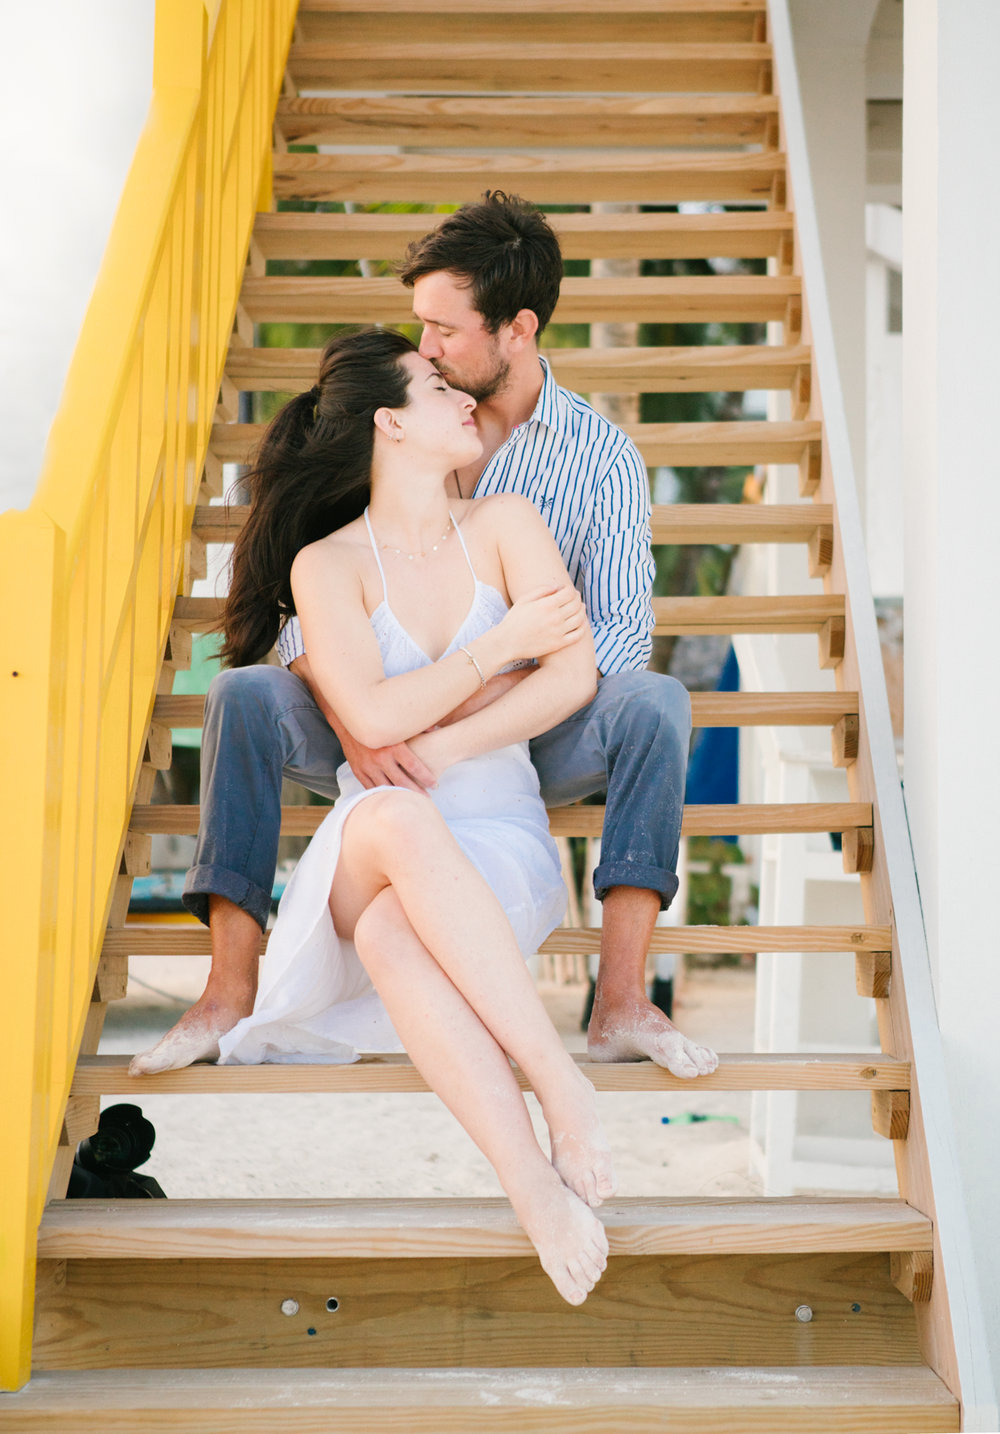 barbados-destination-wedding-photography-videography-love-romance-02